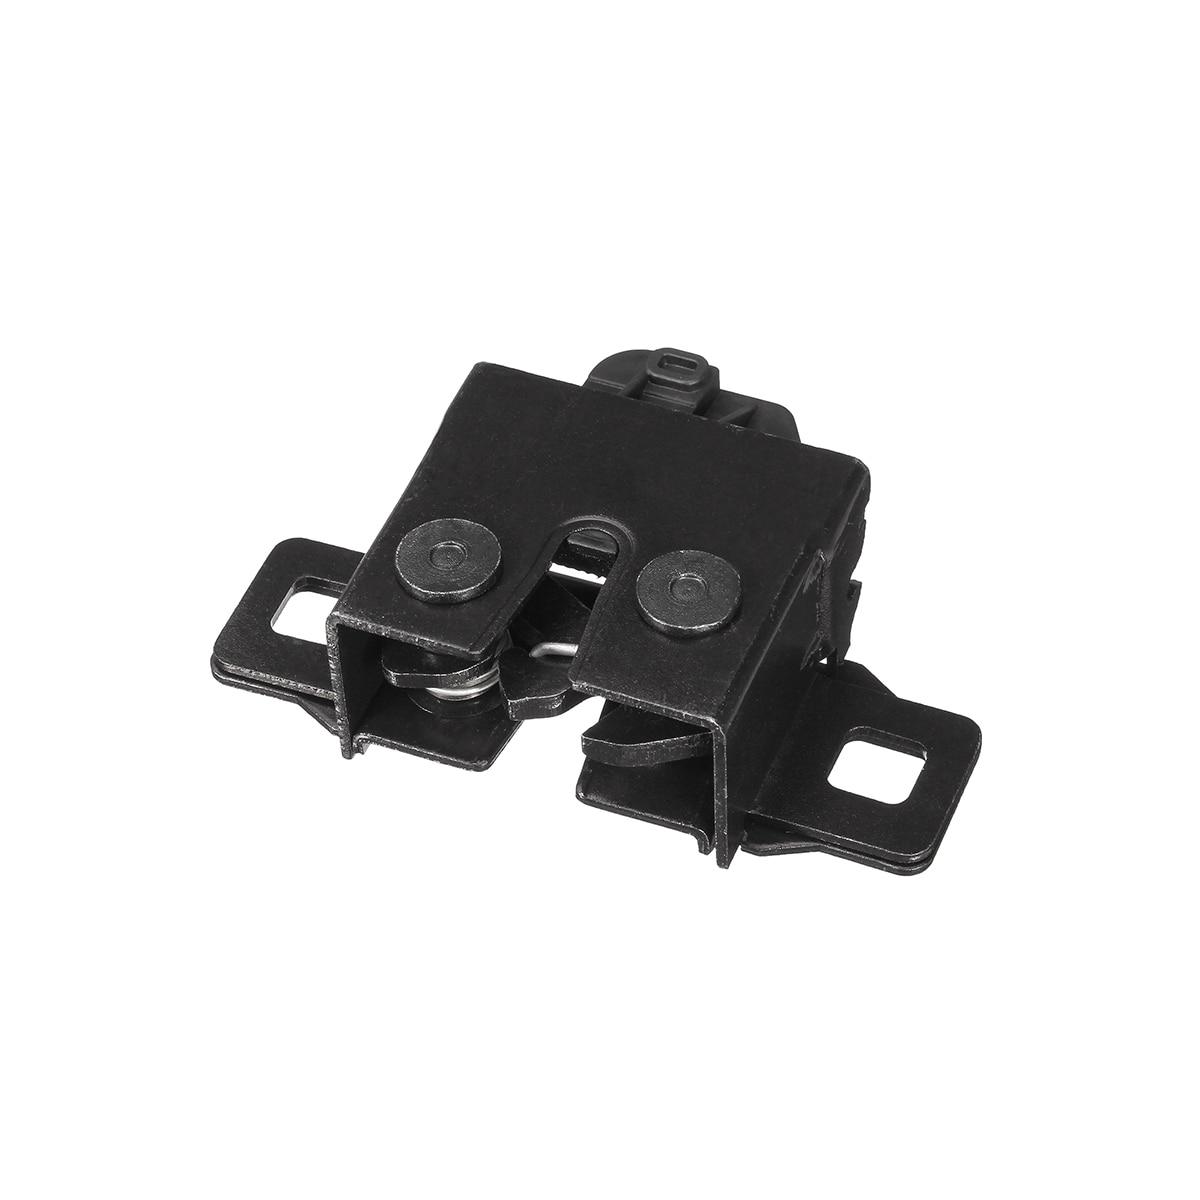 Automobiles Sensors Switch Control Signal Sensor Constructive #lr065340 #lr041431 Hood Alarm Anti-theft Switch Latch Sensor For Land Rover Sport Lr3 Discovery 2 3 4 2005-2018 2006 2007 2008 Traveling